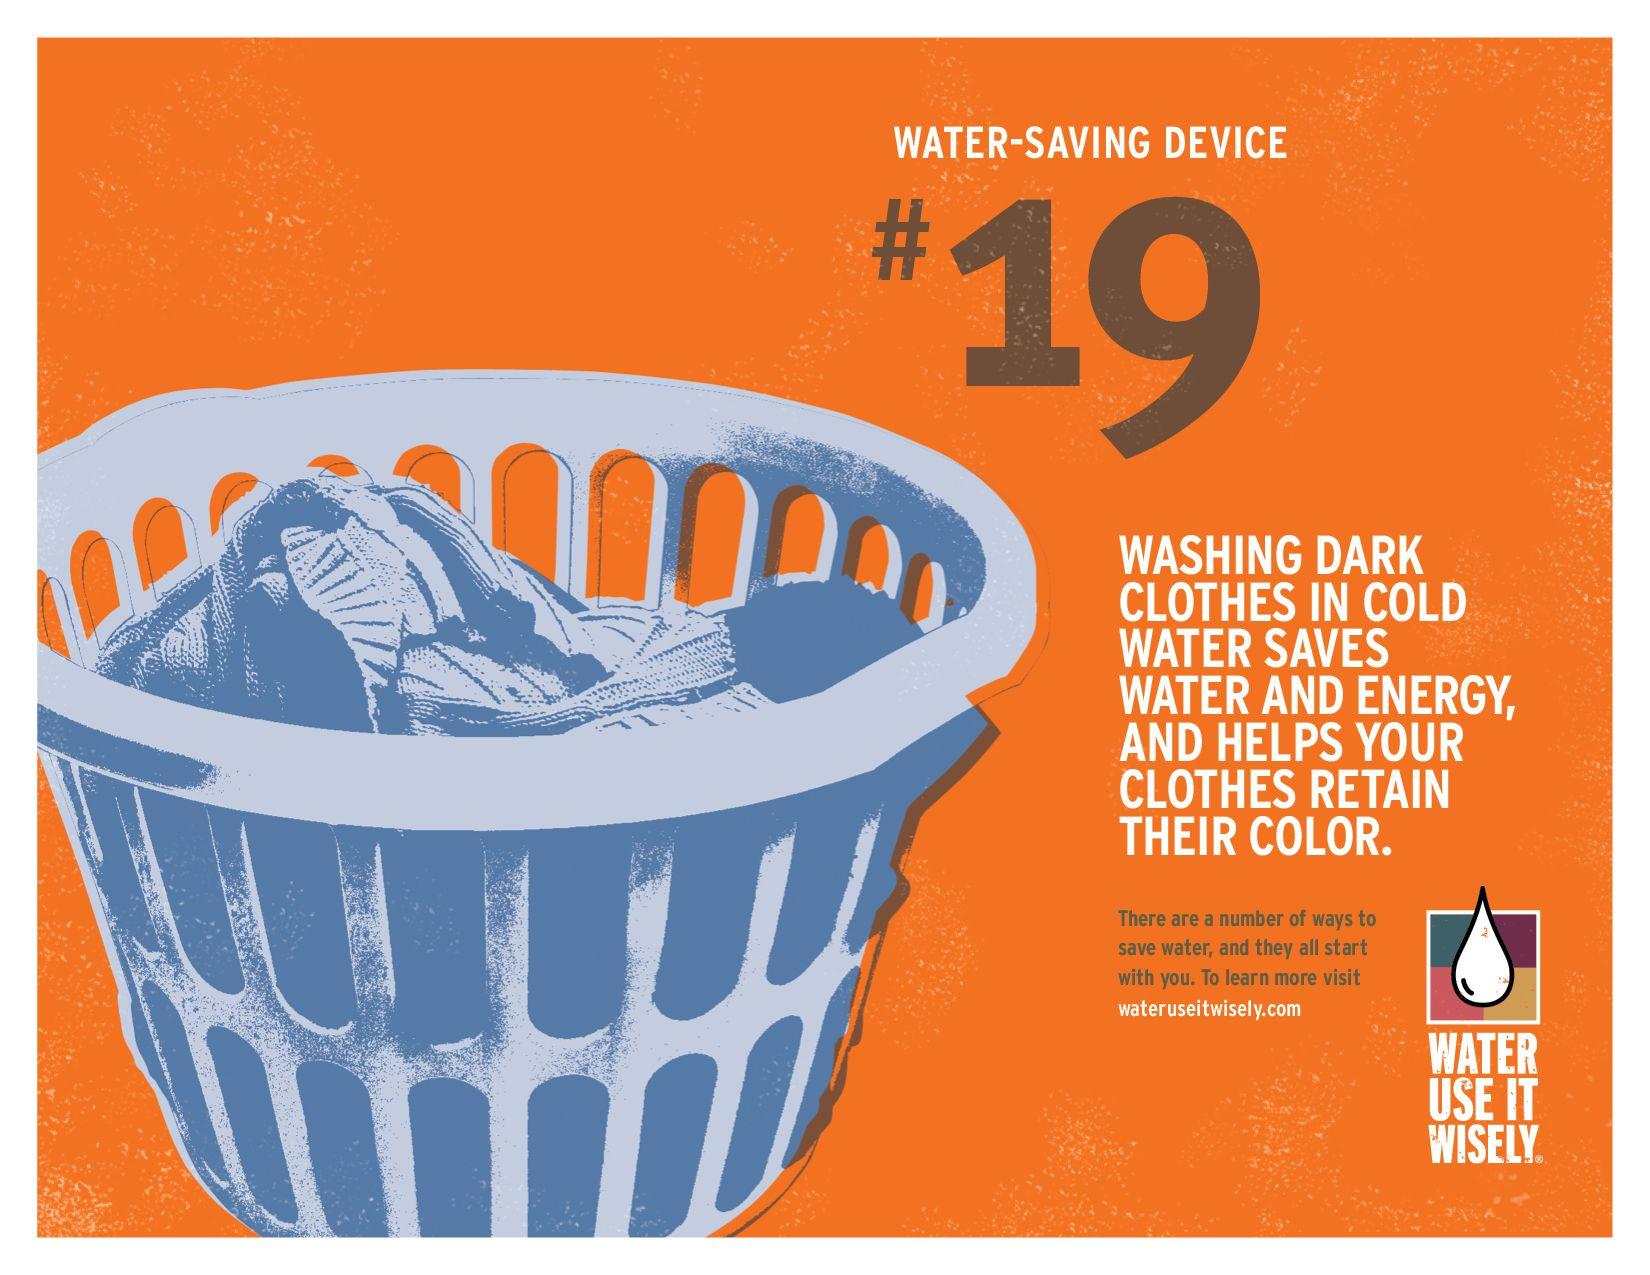 Water Saving Tip No 19 Washing Dark Clothes In Cold